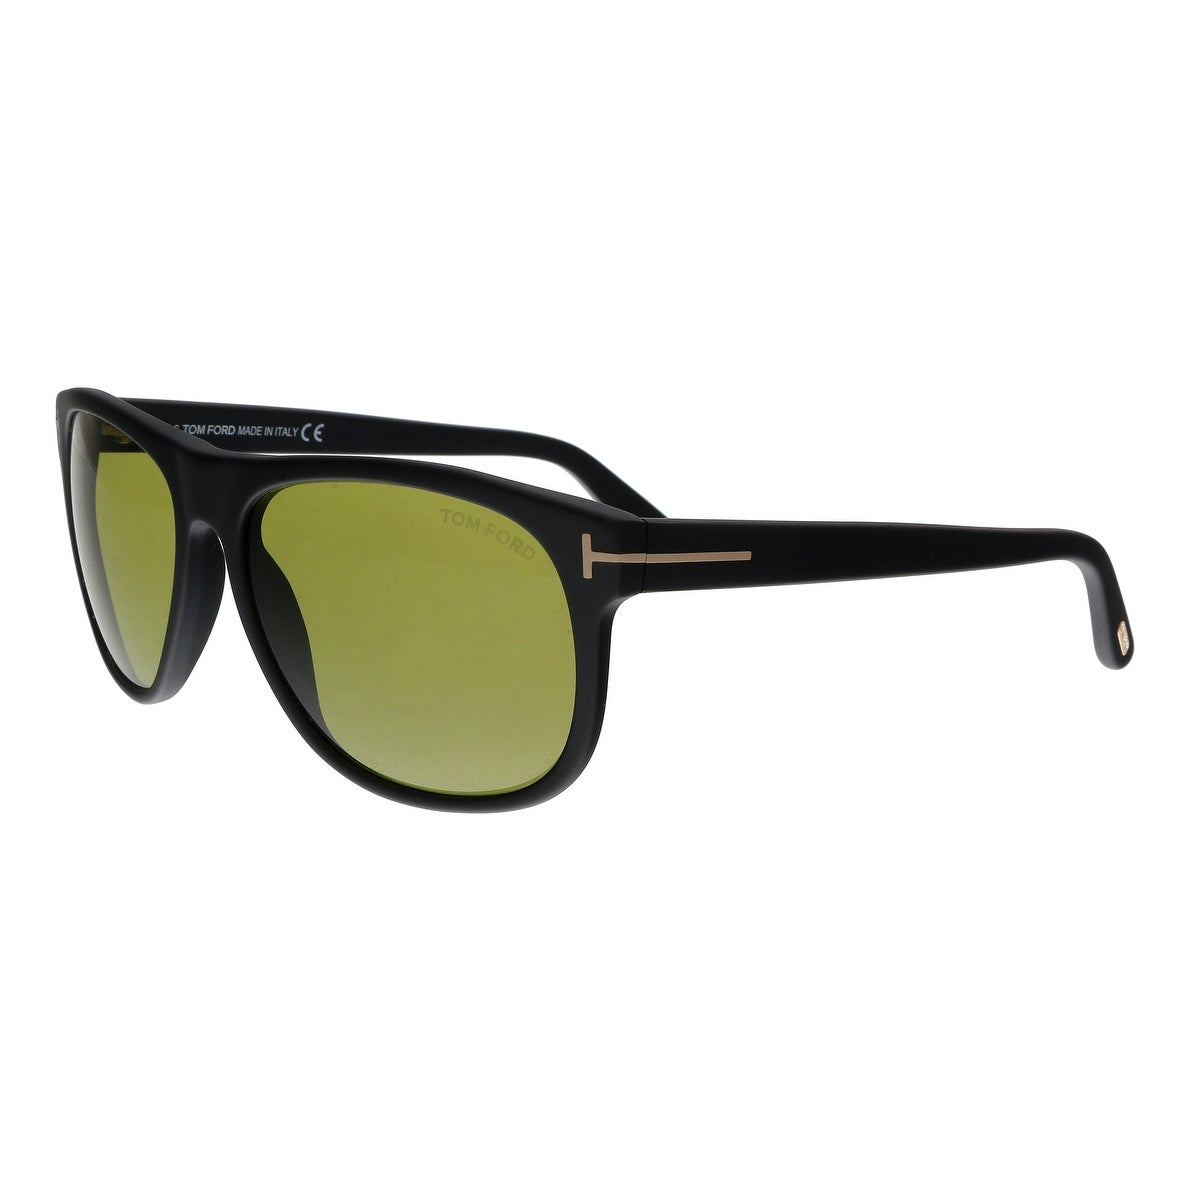 d565bf750daa4 Tom Ford FT0236 02N Olivier Matte Black Rectangular Sunglasses - No Size